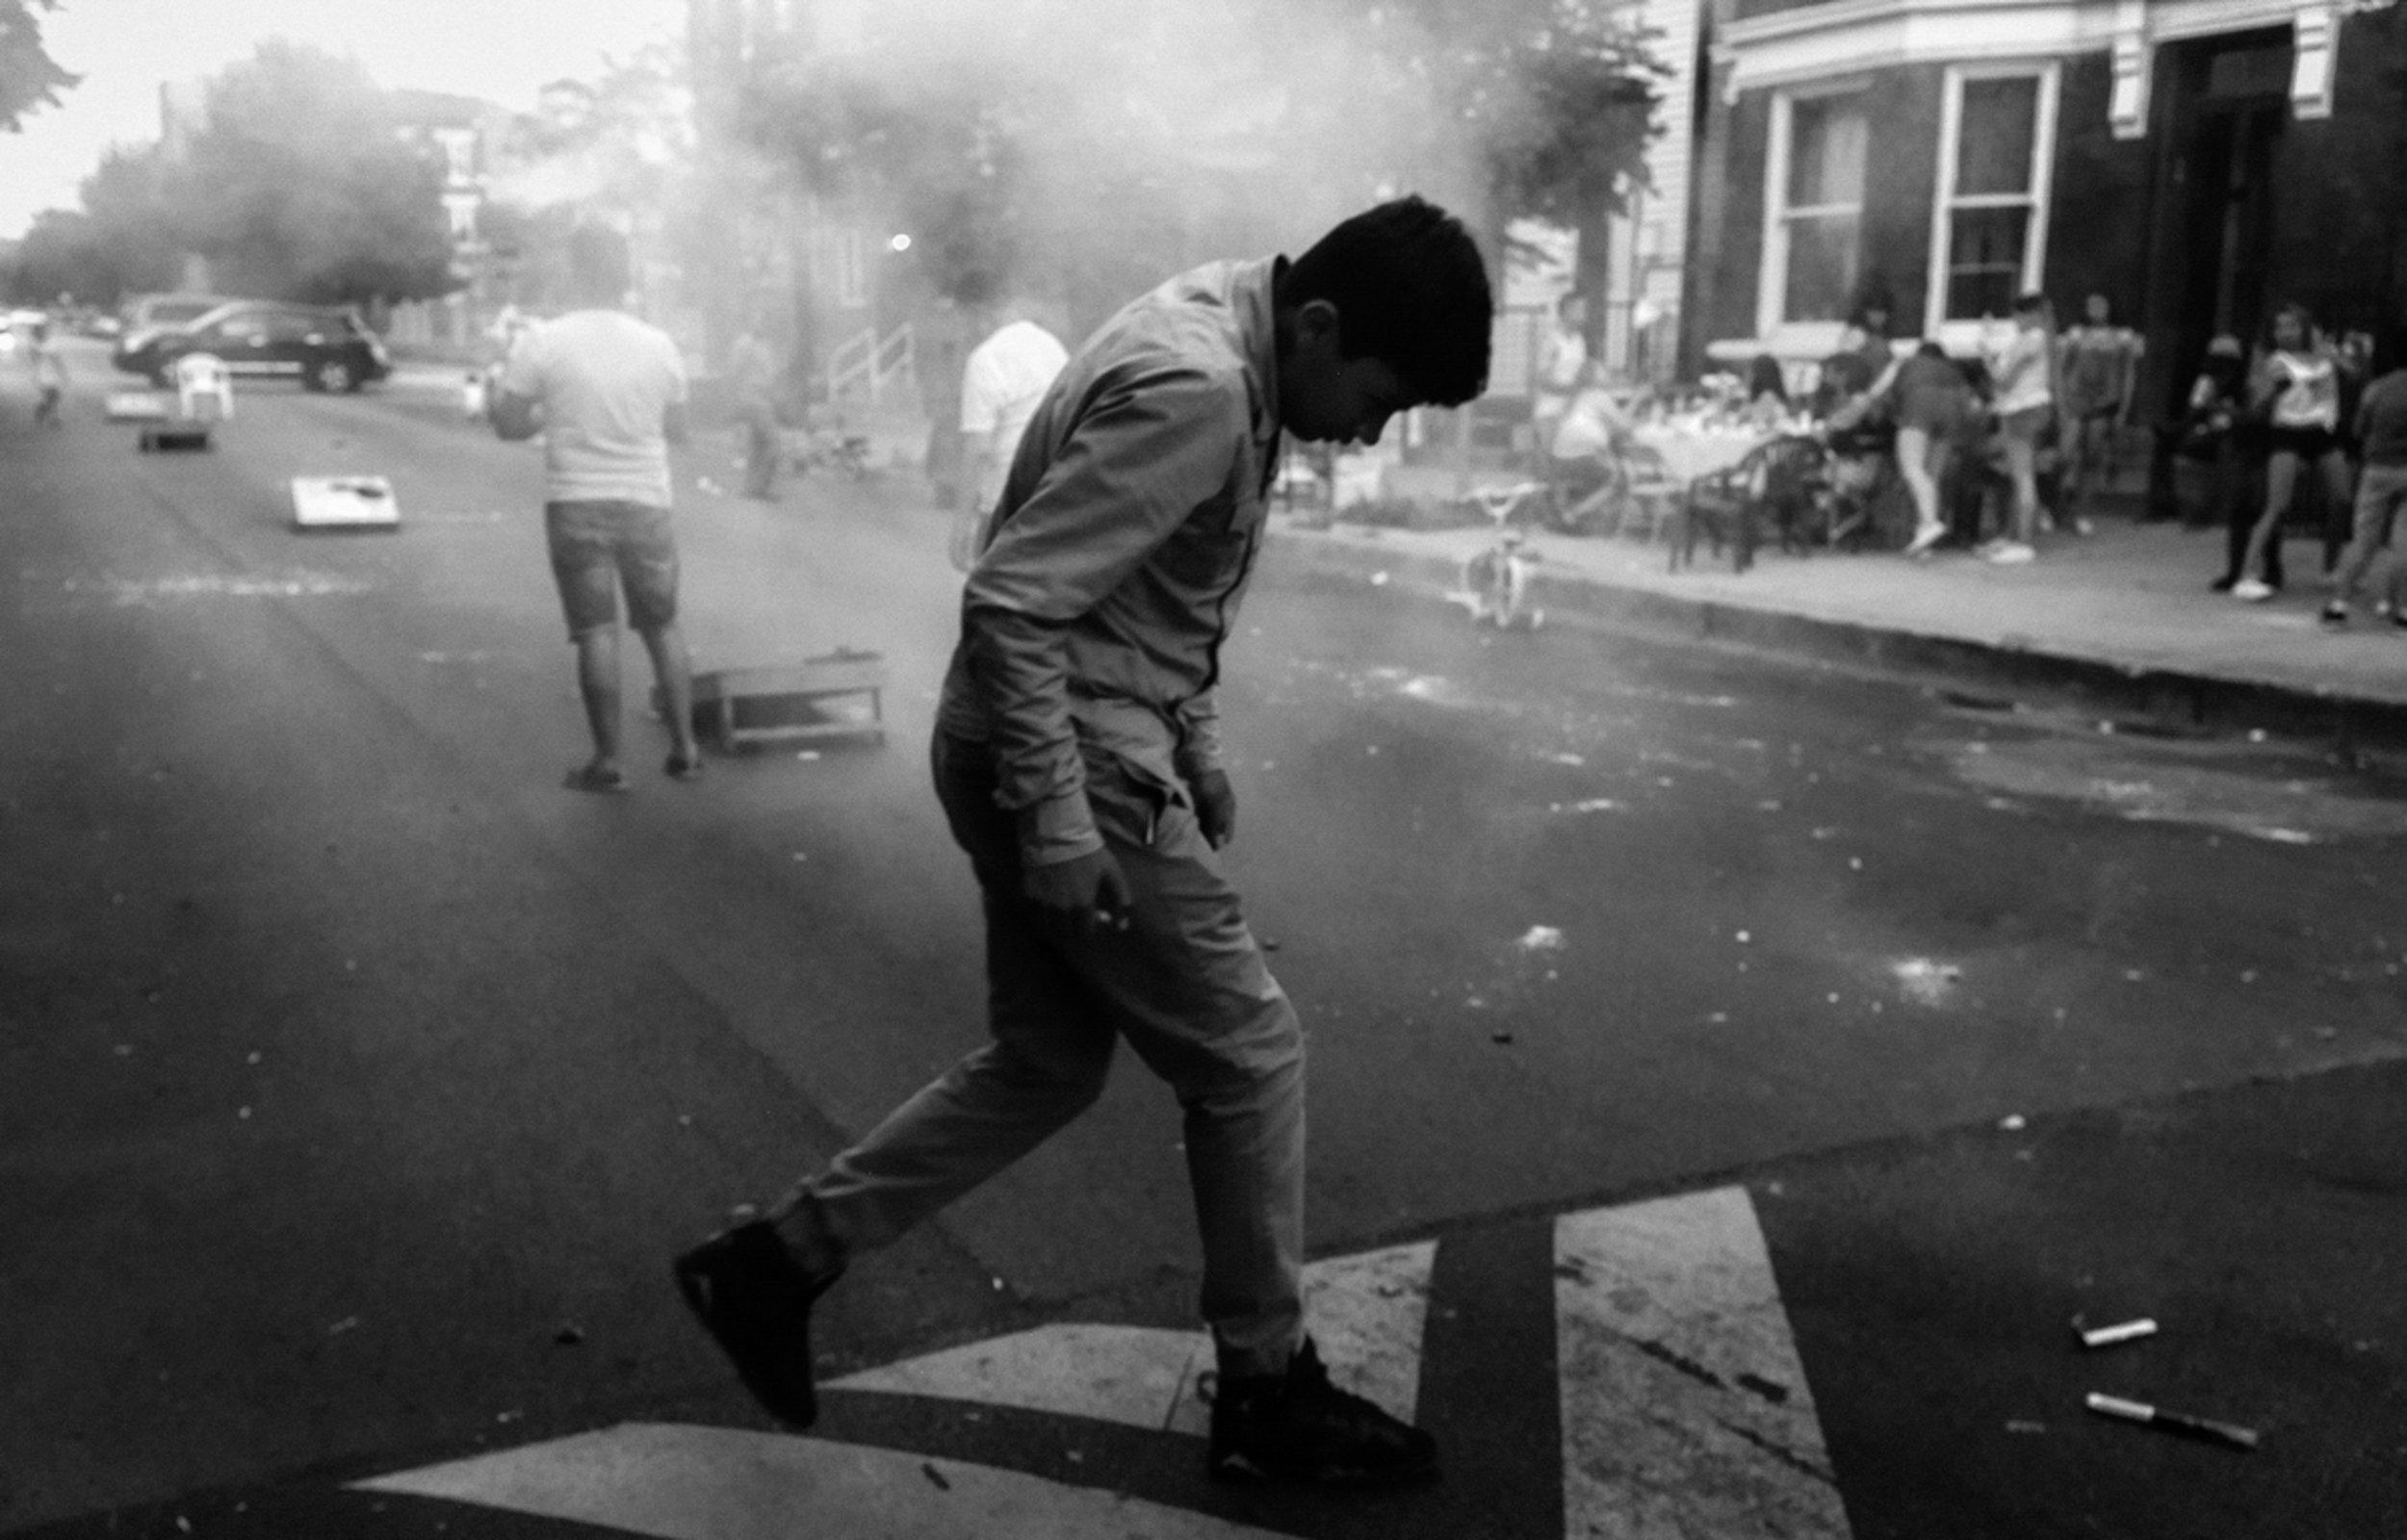 A boy walks through smoke on the fourth of July in 2017.